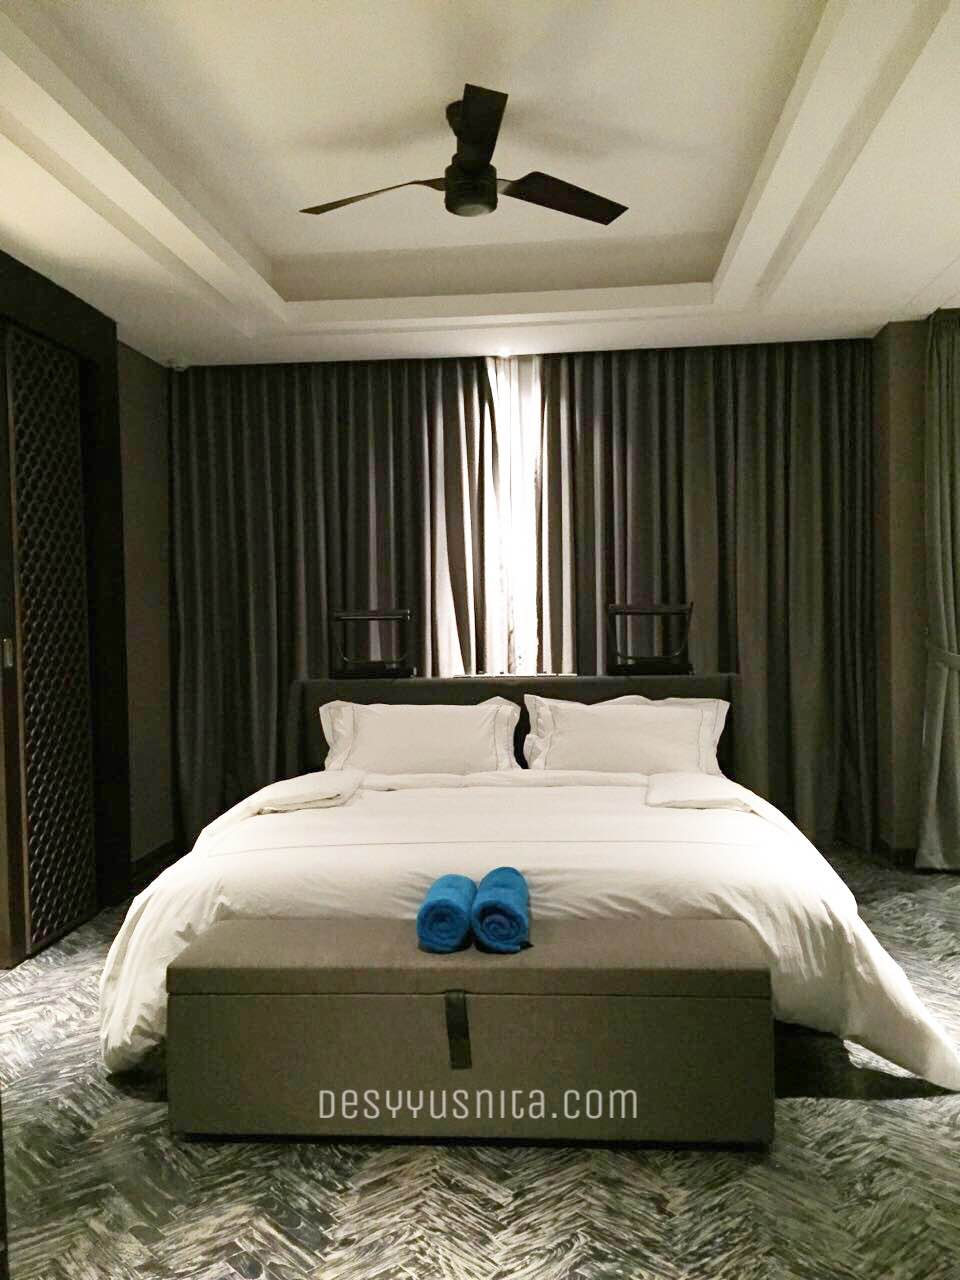 Resort di Bali, Staycation, Resort Exclusive, Resort di Uluwatu